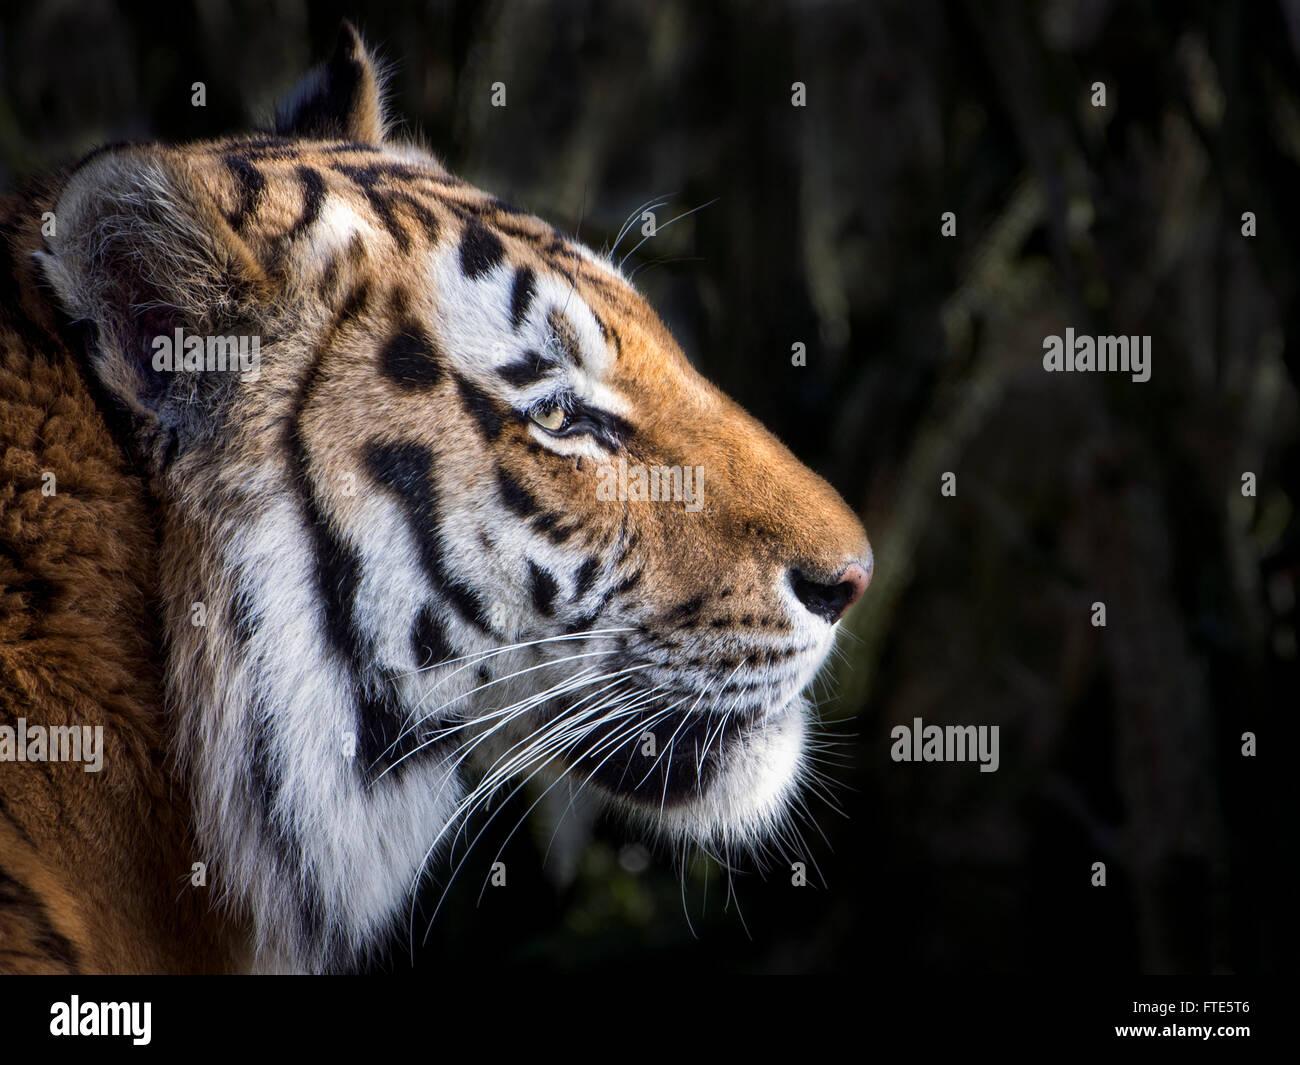 Male Amur (Siberian) tiger (profile) - Stock Image